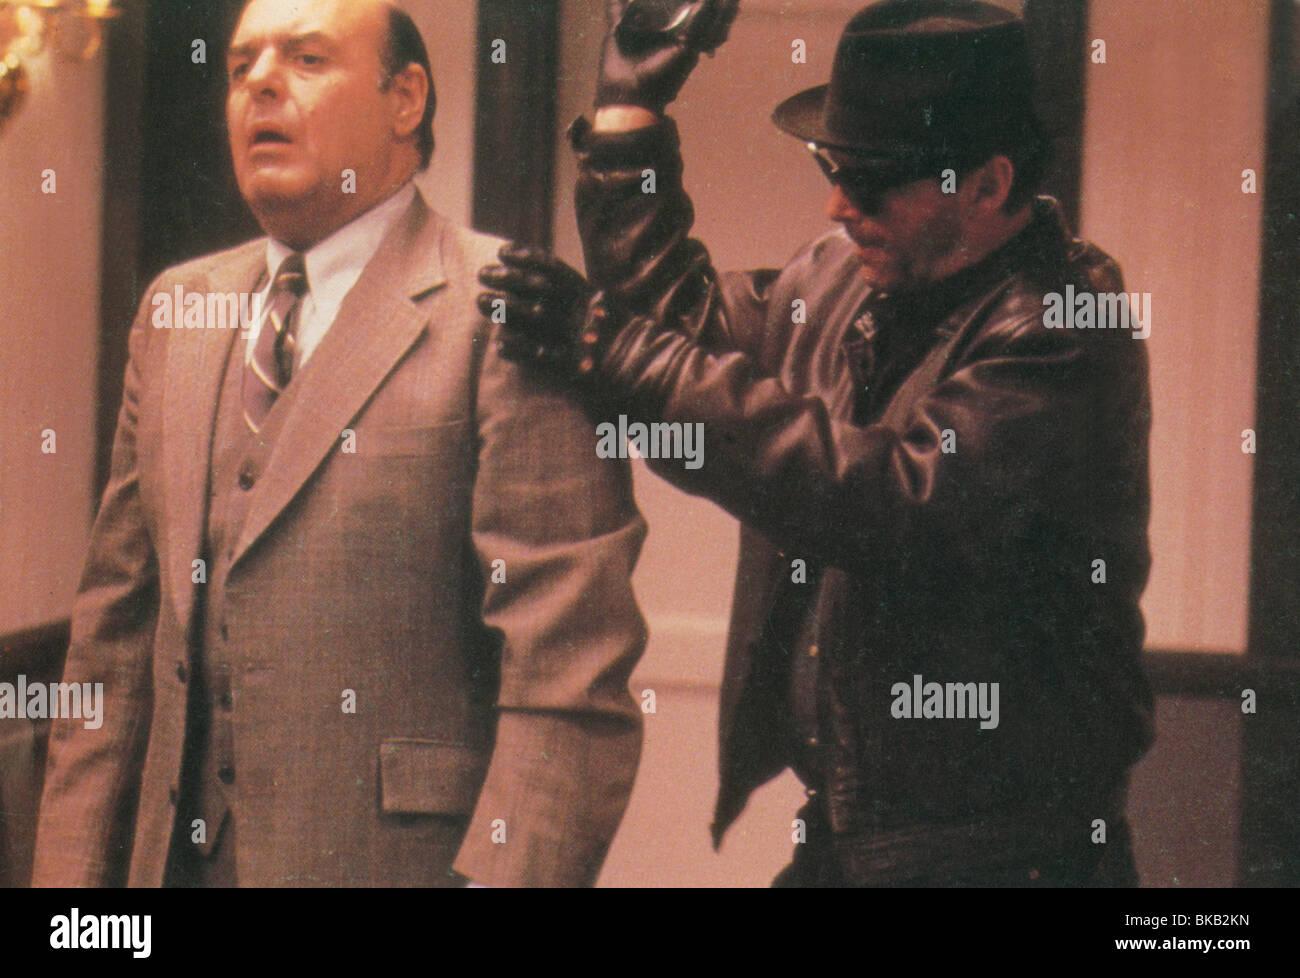 PRIZZI'S HONOR -1985 - Stock Image